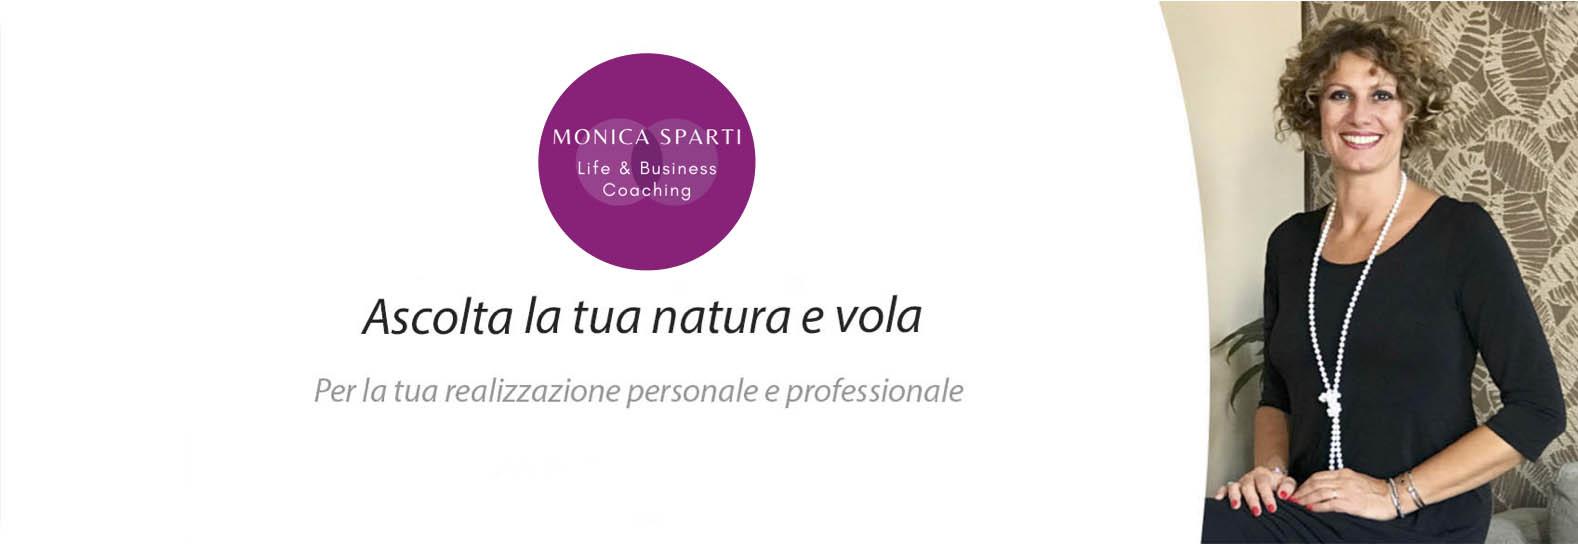 Monica Sparti - Life Coach